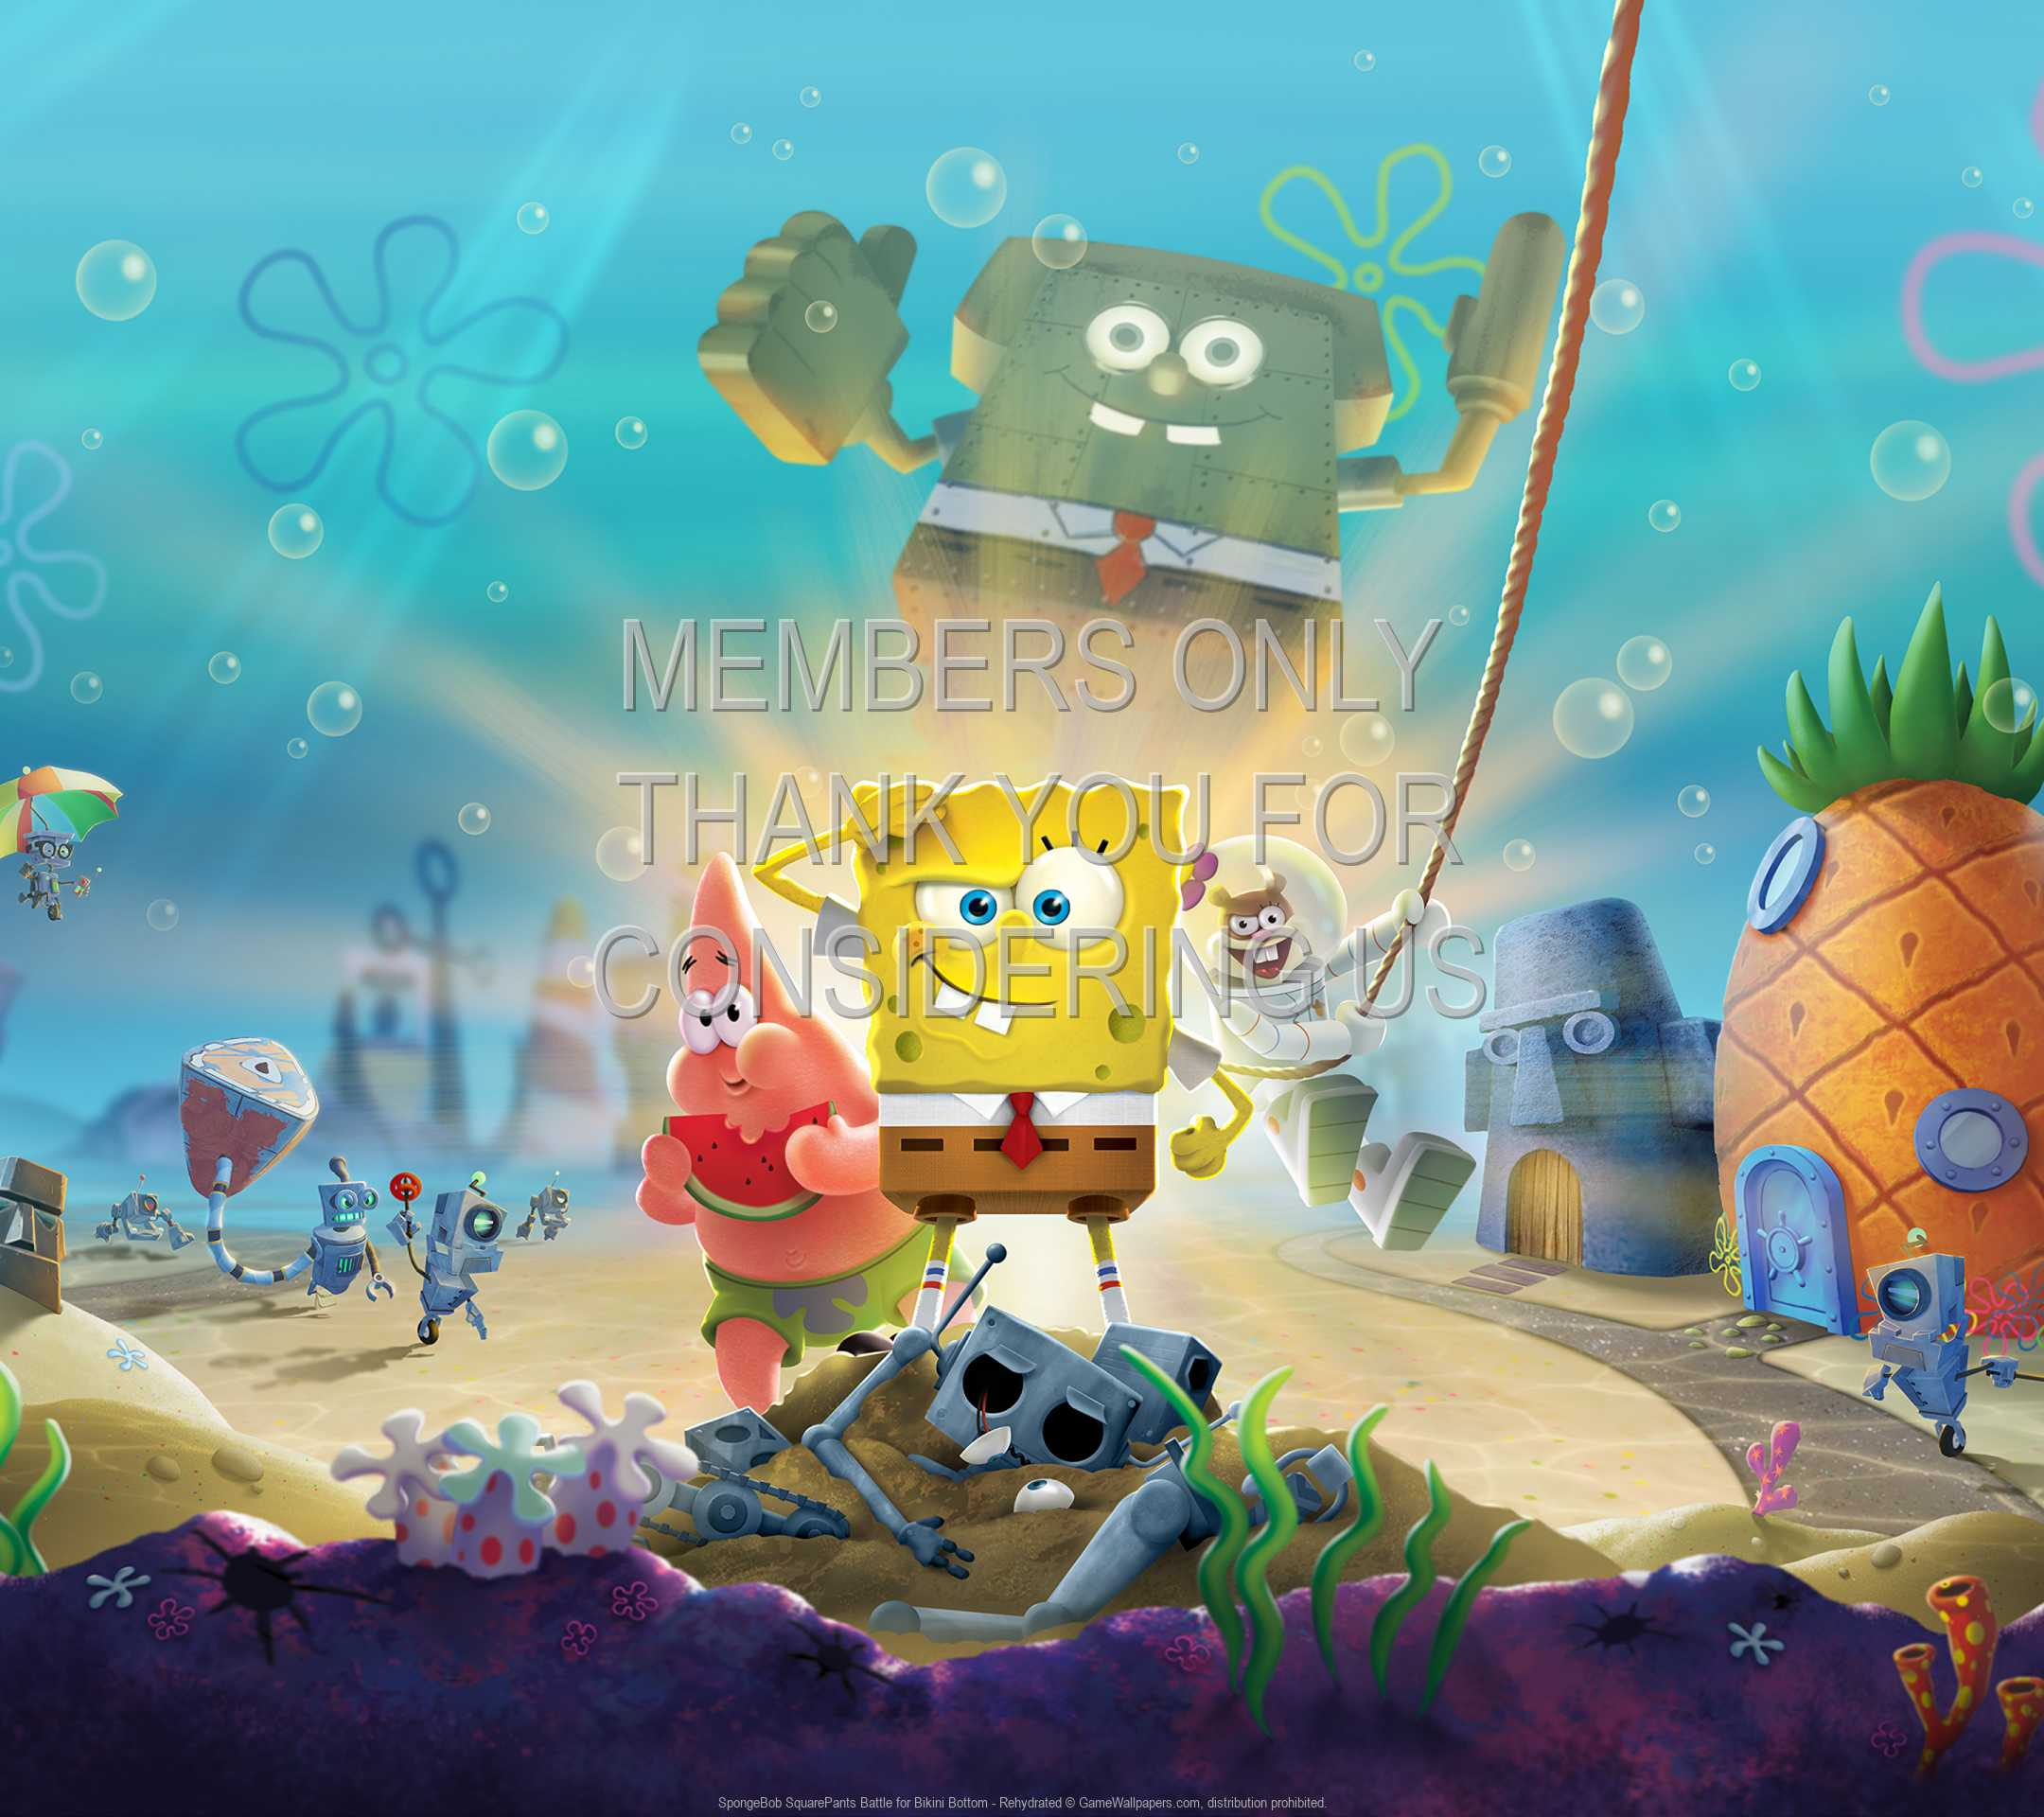 SpongeBob SquarePants: Battle for Bikini Bottom - Rehydrated 1080p Horizontal Mobile wallpaper or background 01